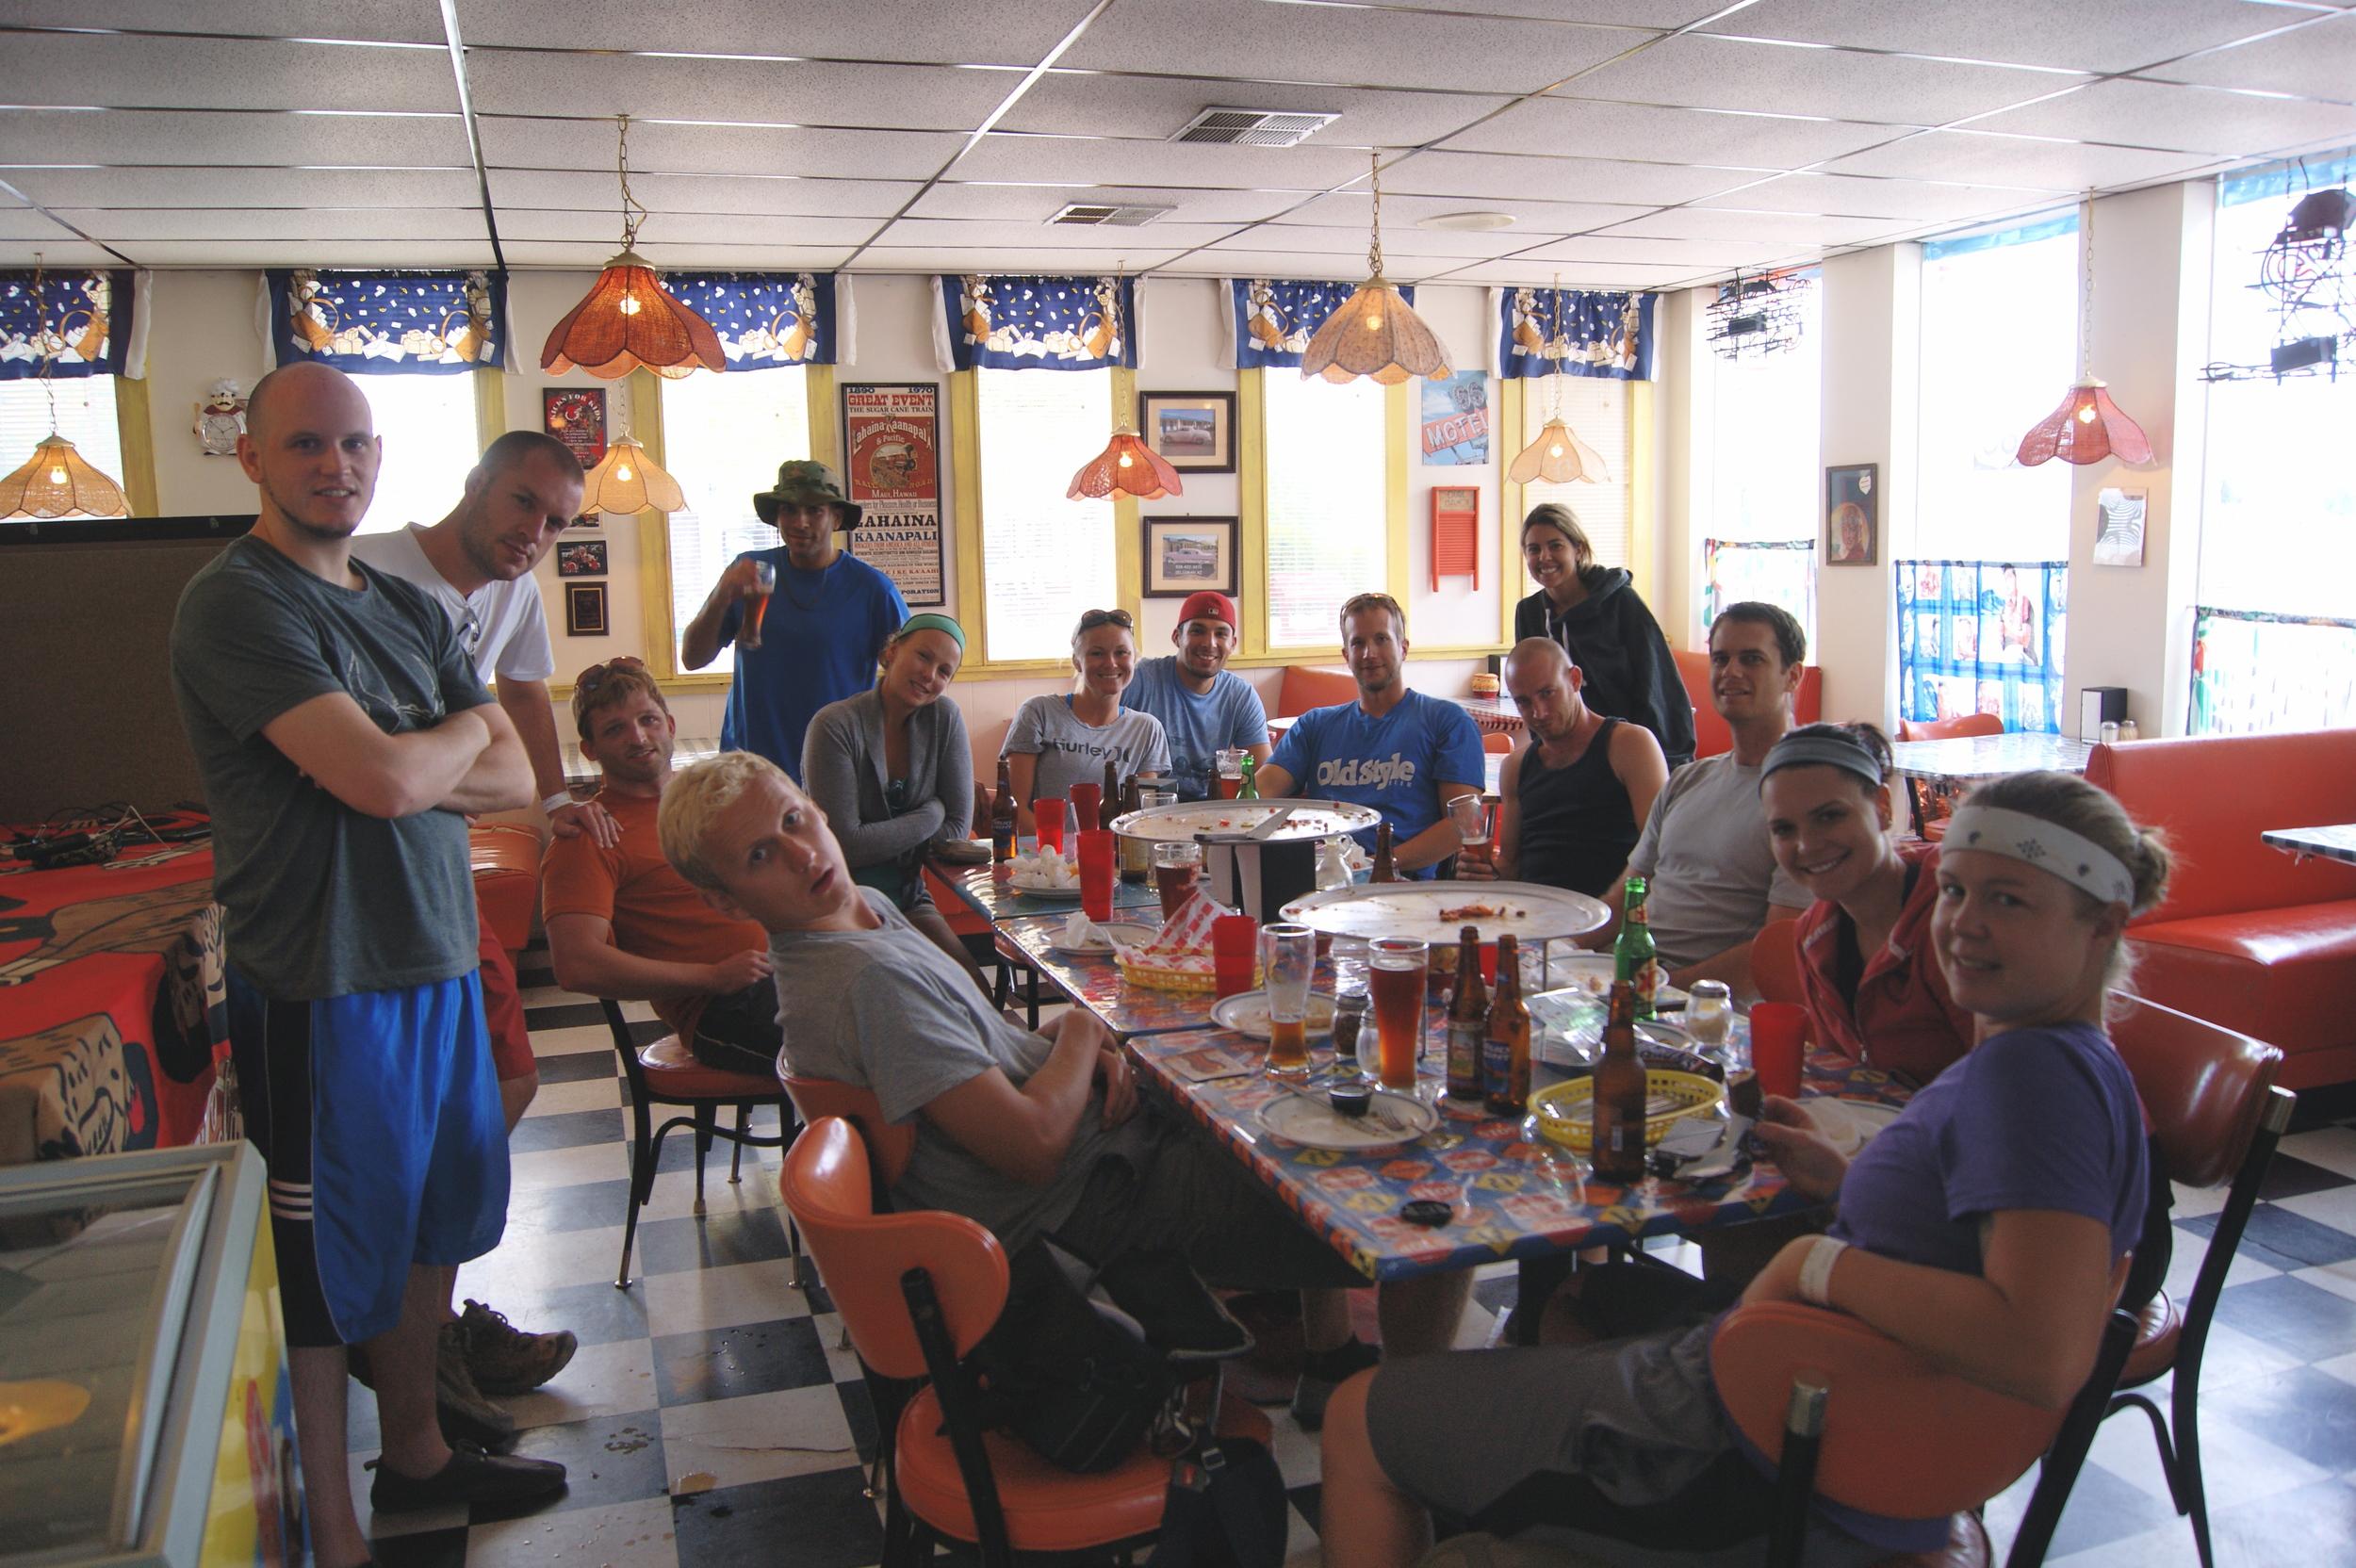 Post-trek pizza at Stagecoach 66